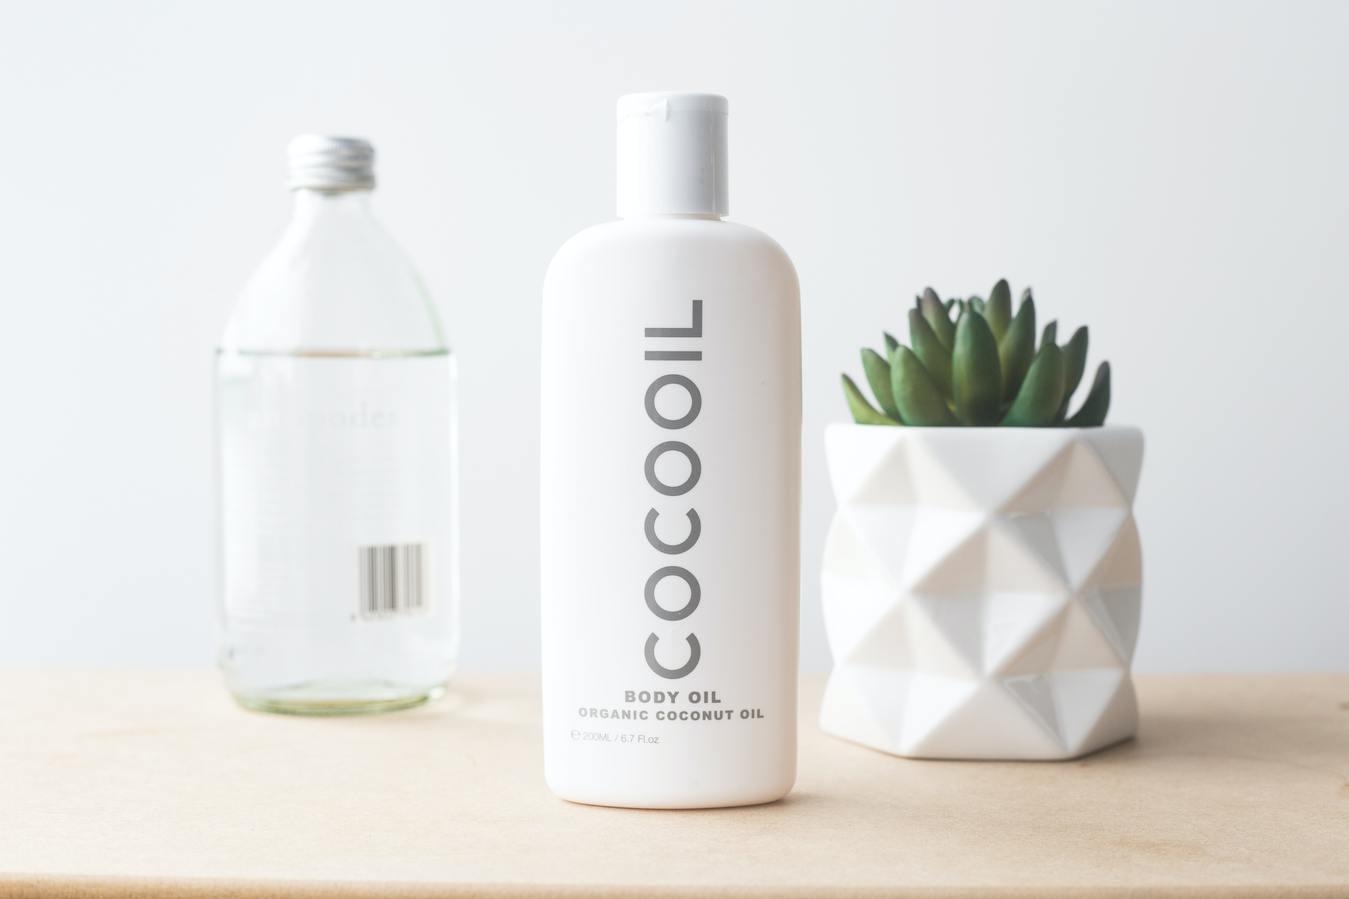 Produk kecantikan body oil